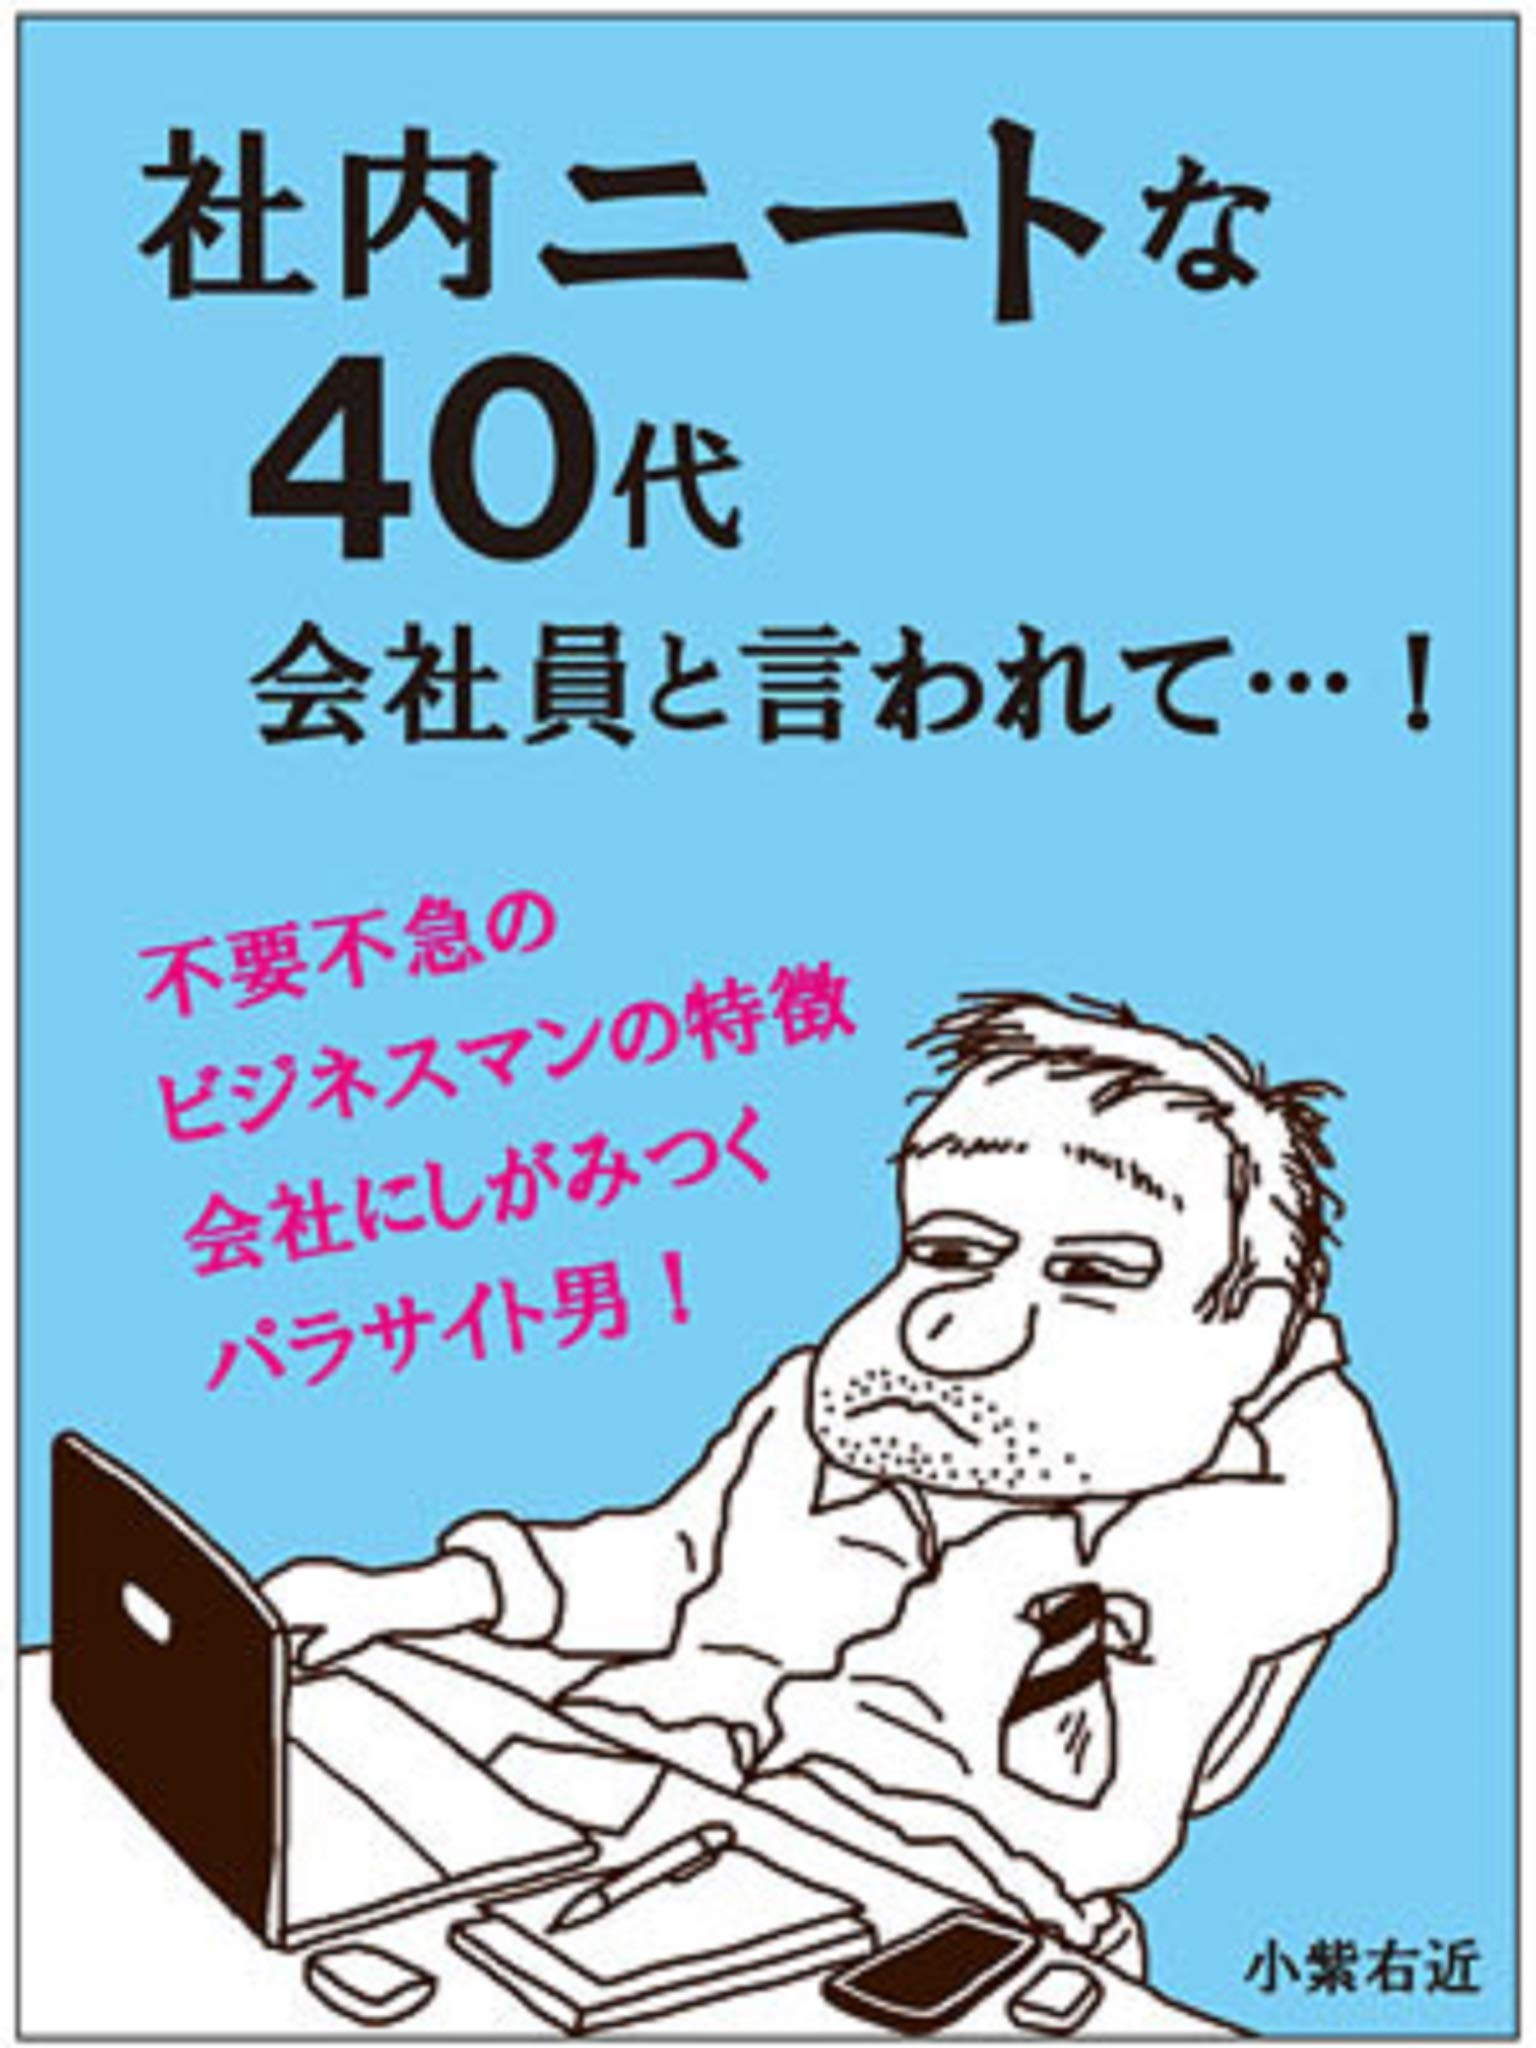 syanainiitonayonzyuudaikaisyaintoiwarete (Japanese Edition)